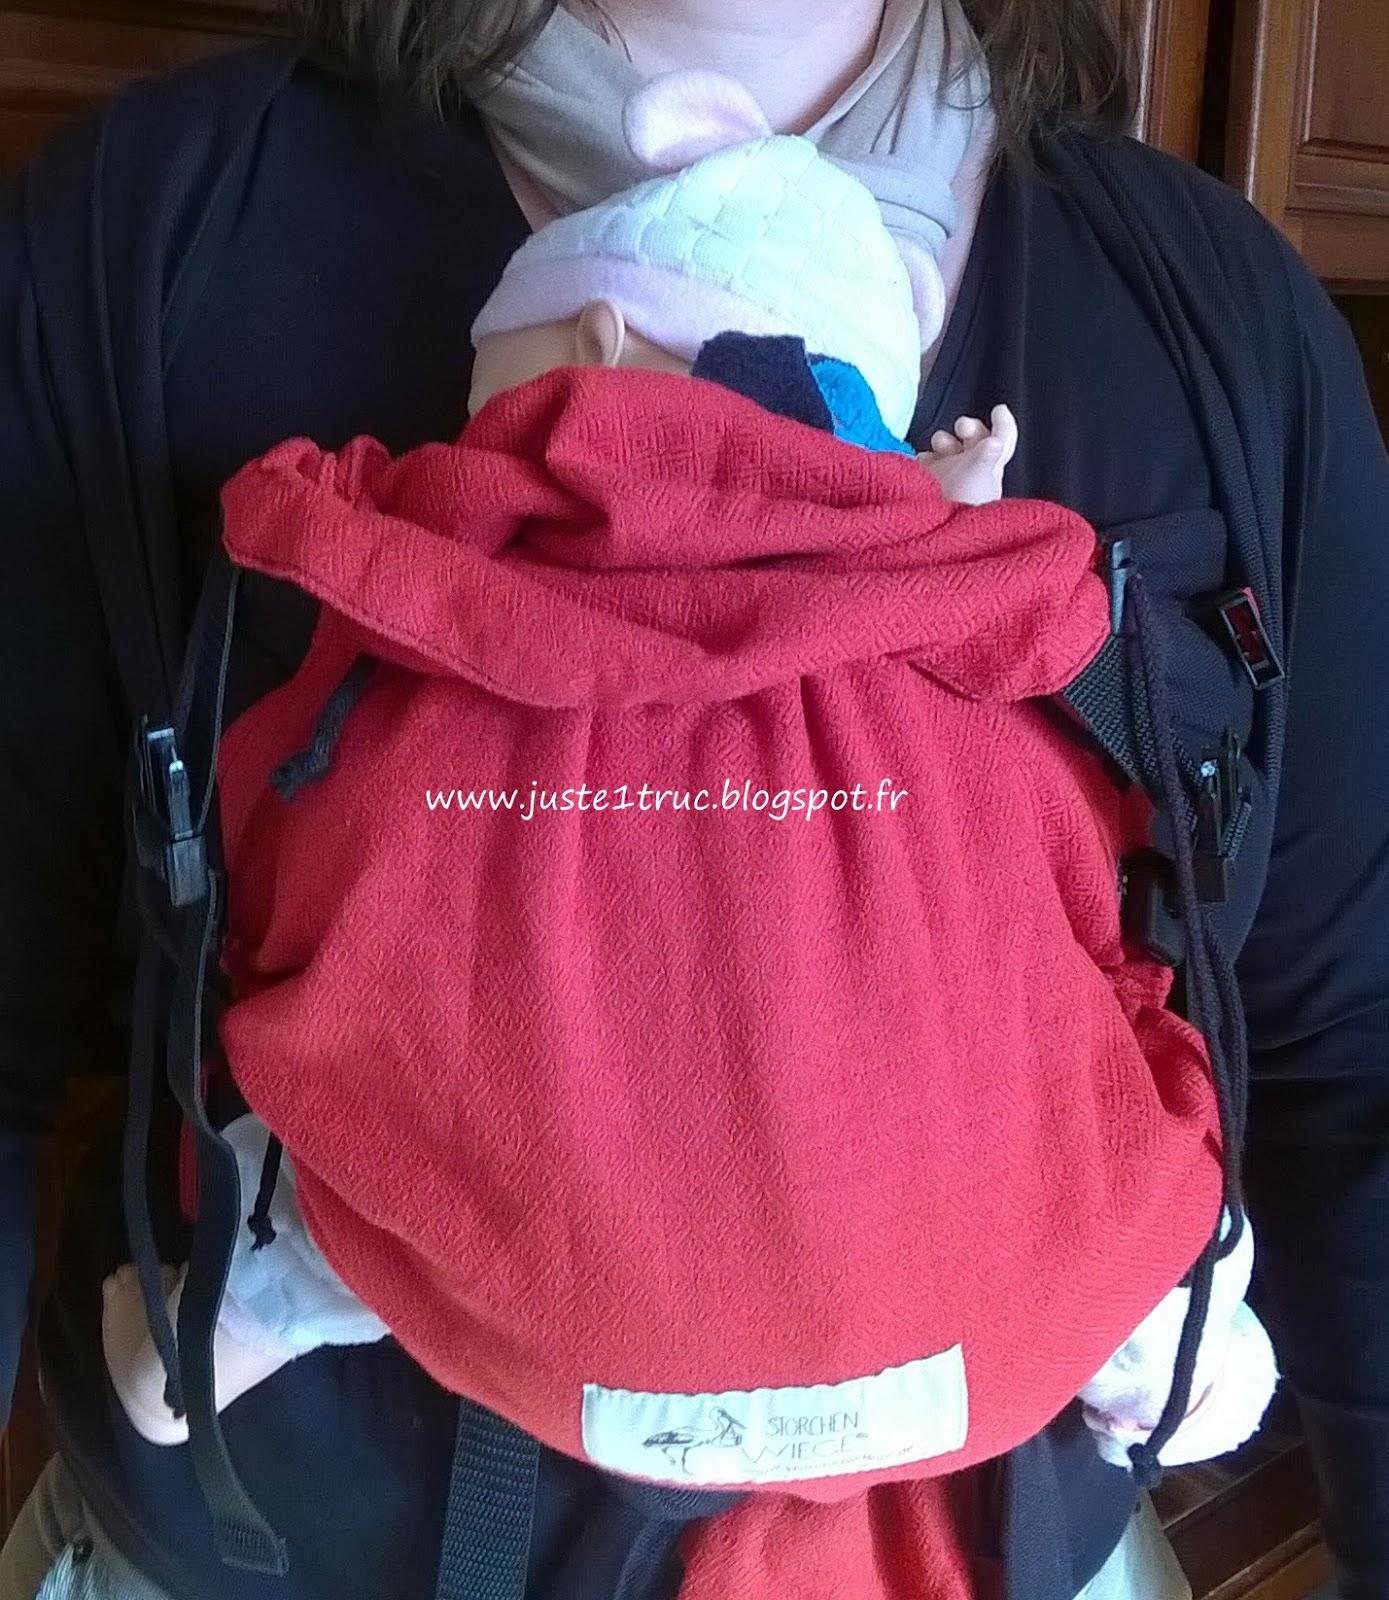 test babycarrier storchenwiege meï-taï meitai babywearing portage avis  mesures bretelles hybride clip boucle sangle c52cf6f8c36